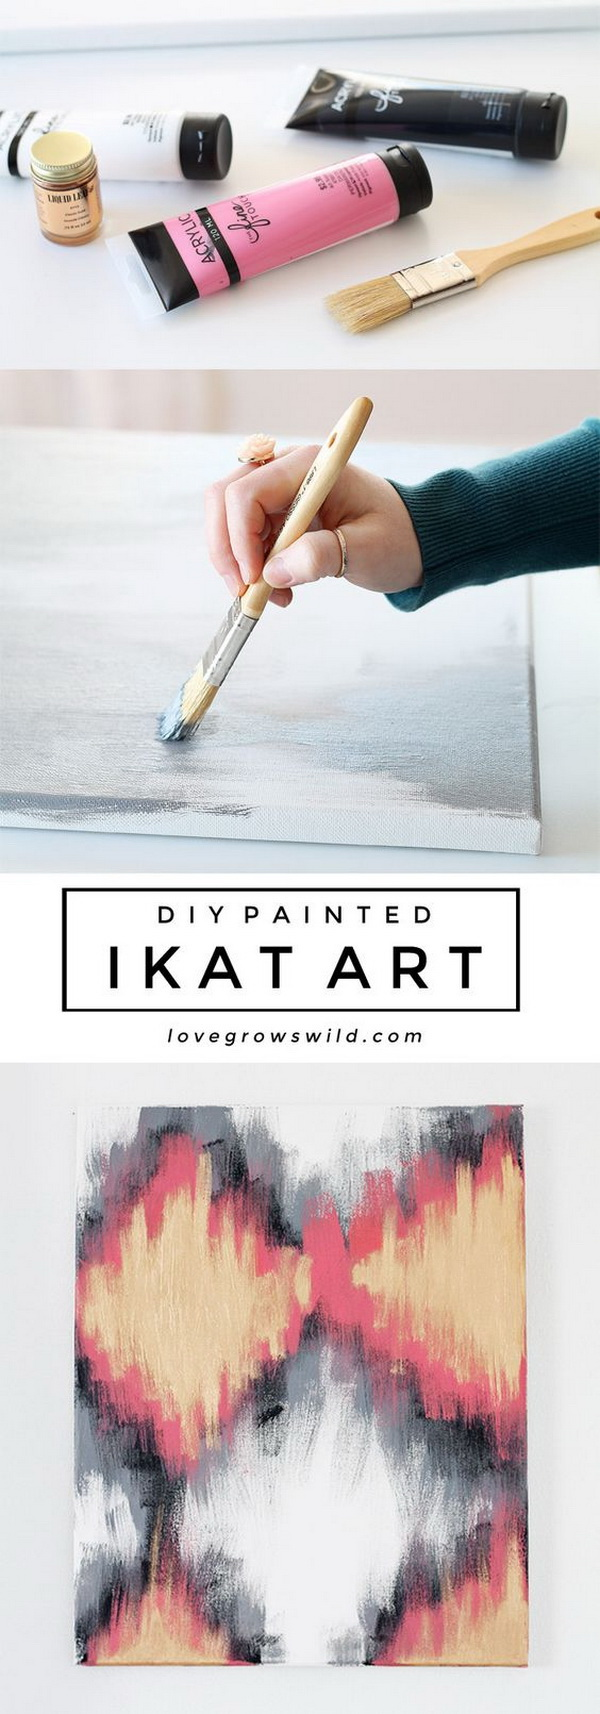 DIY Painted Ikat Art.